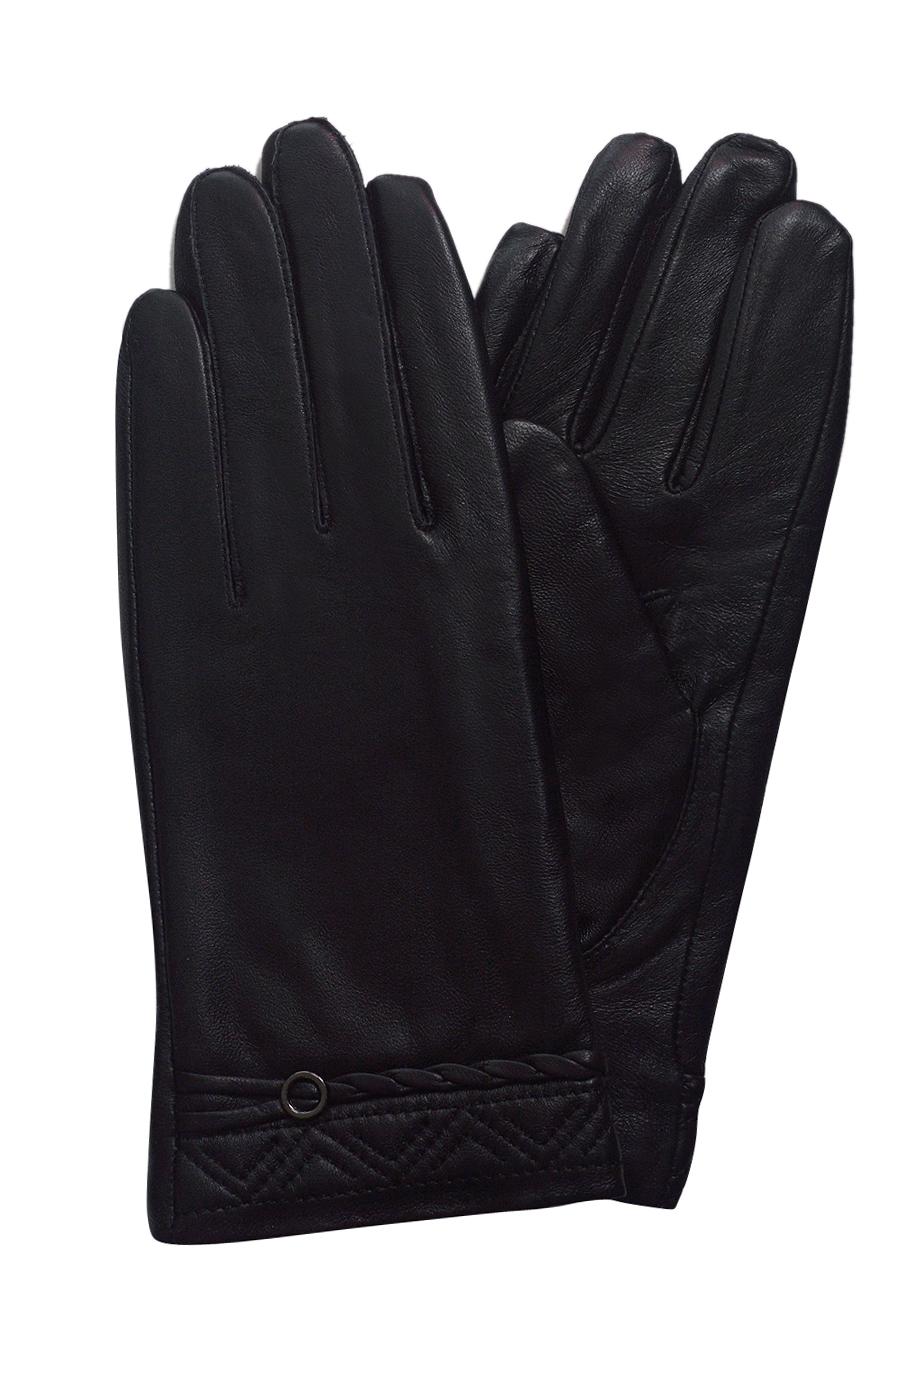 Găng tay nữ ELMI da dê cao cấp EGW135